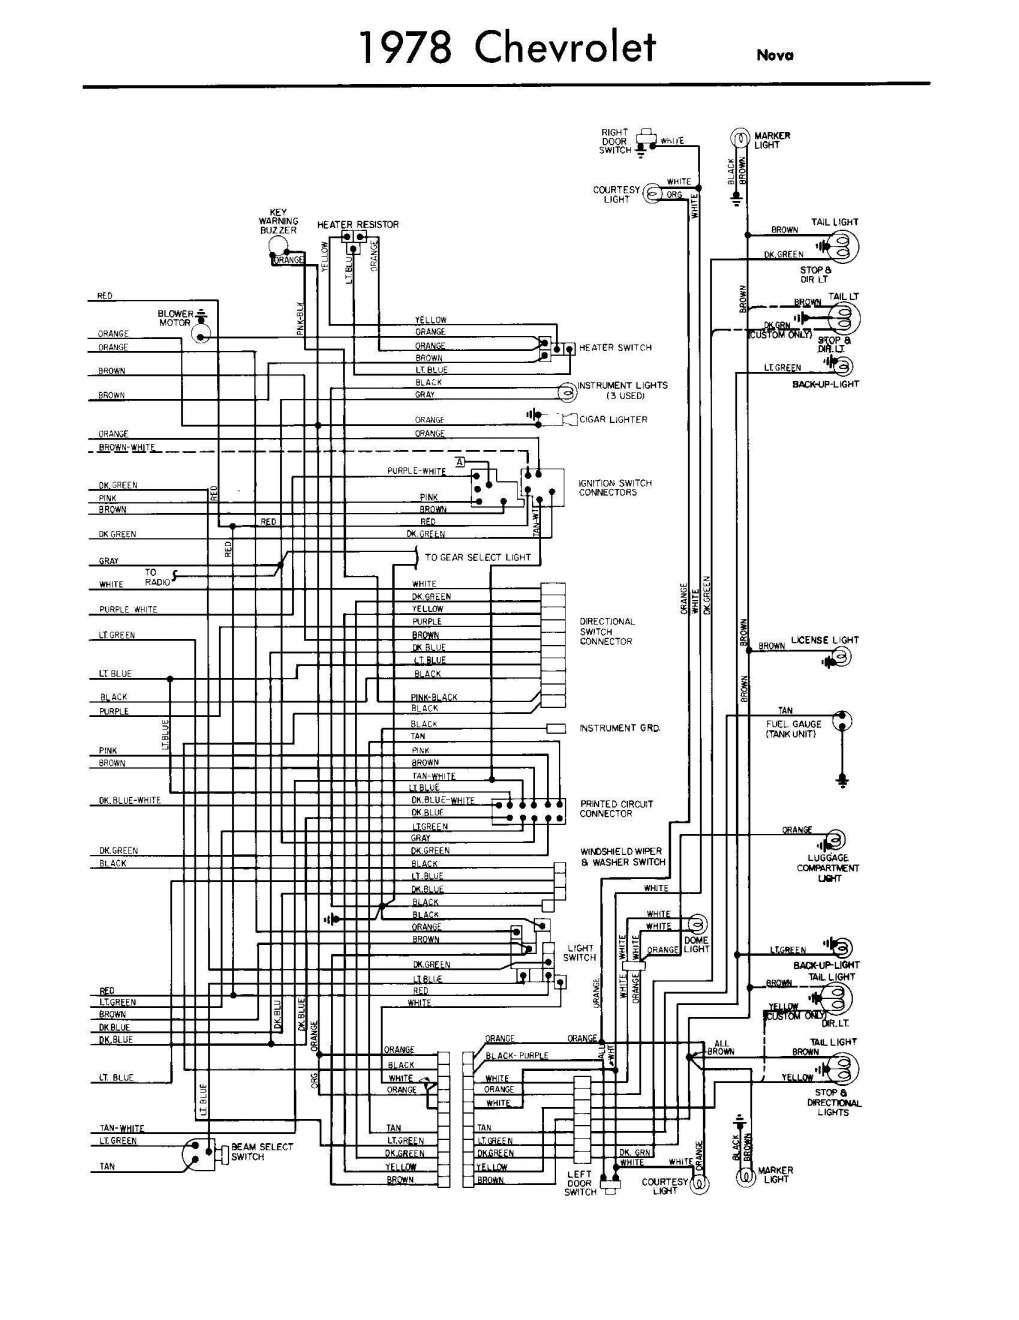 1978 Chevrolet Alternator Wiring Diagram Free Download